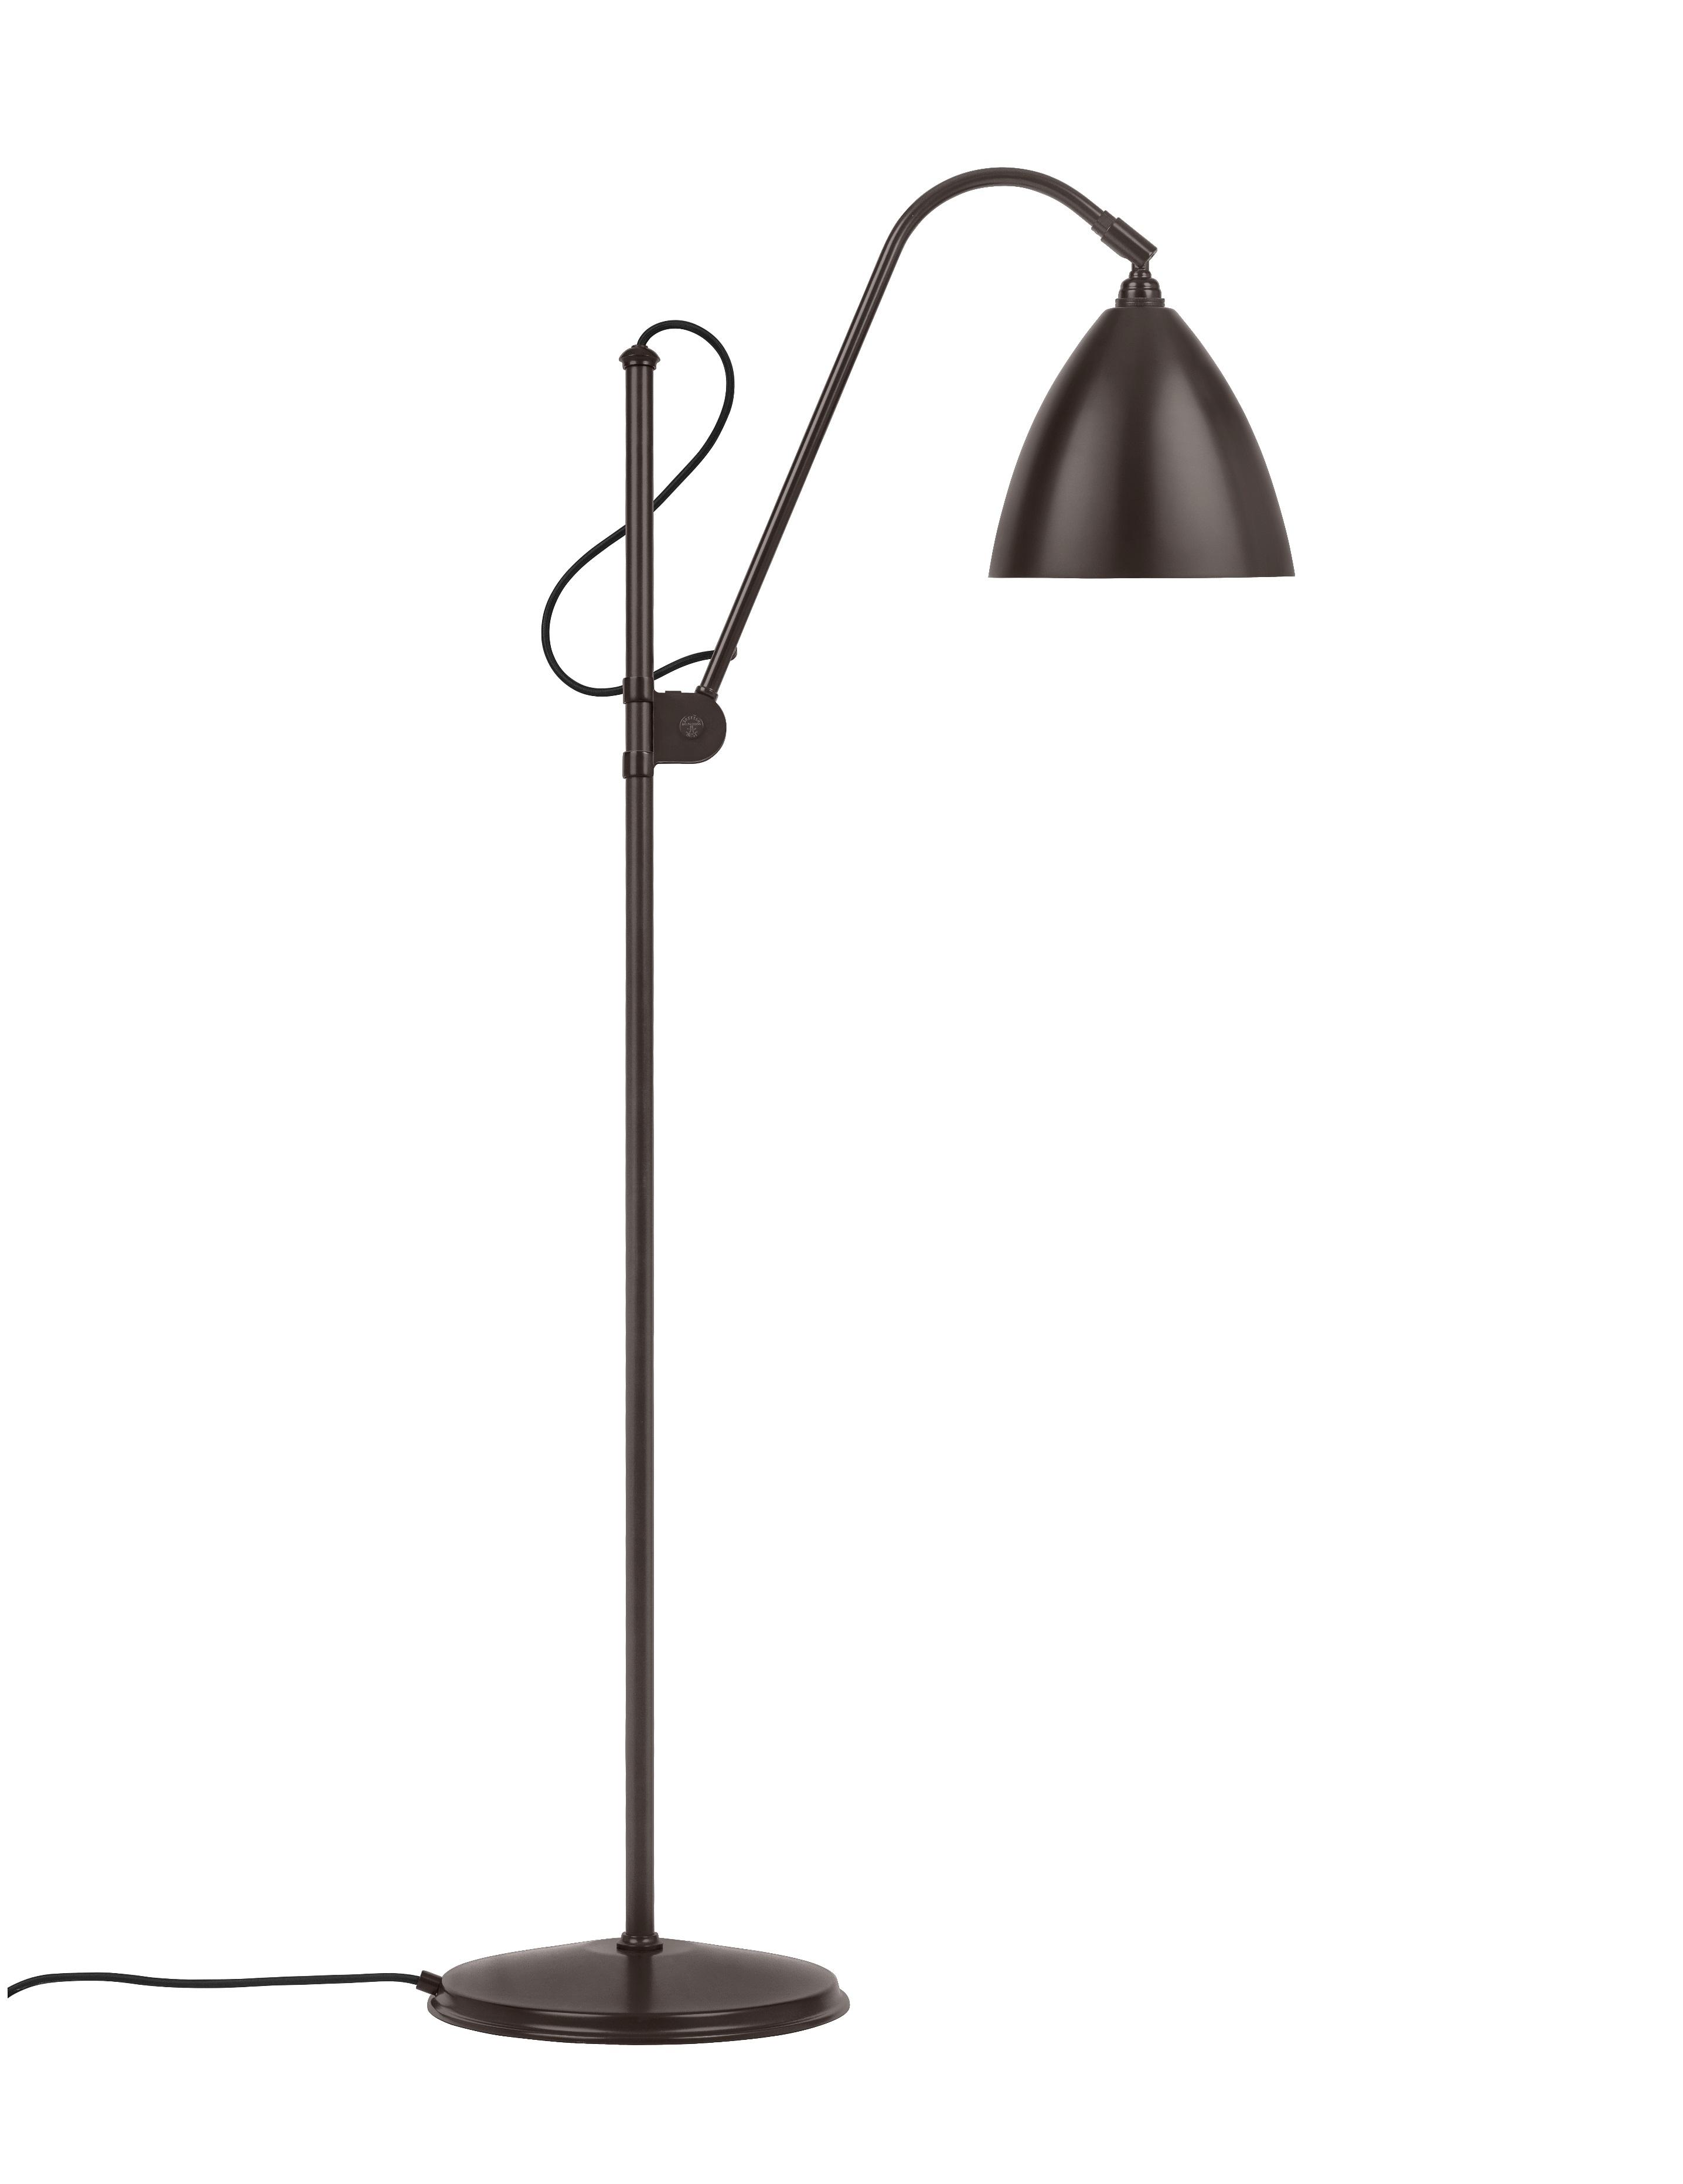 bestlite Bl3 m gulvlampe sort/sort messing - bestlite på luxlight.dk